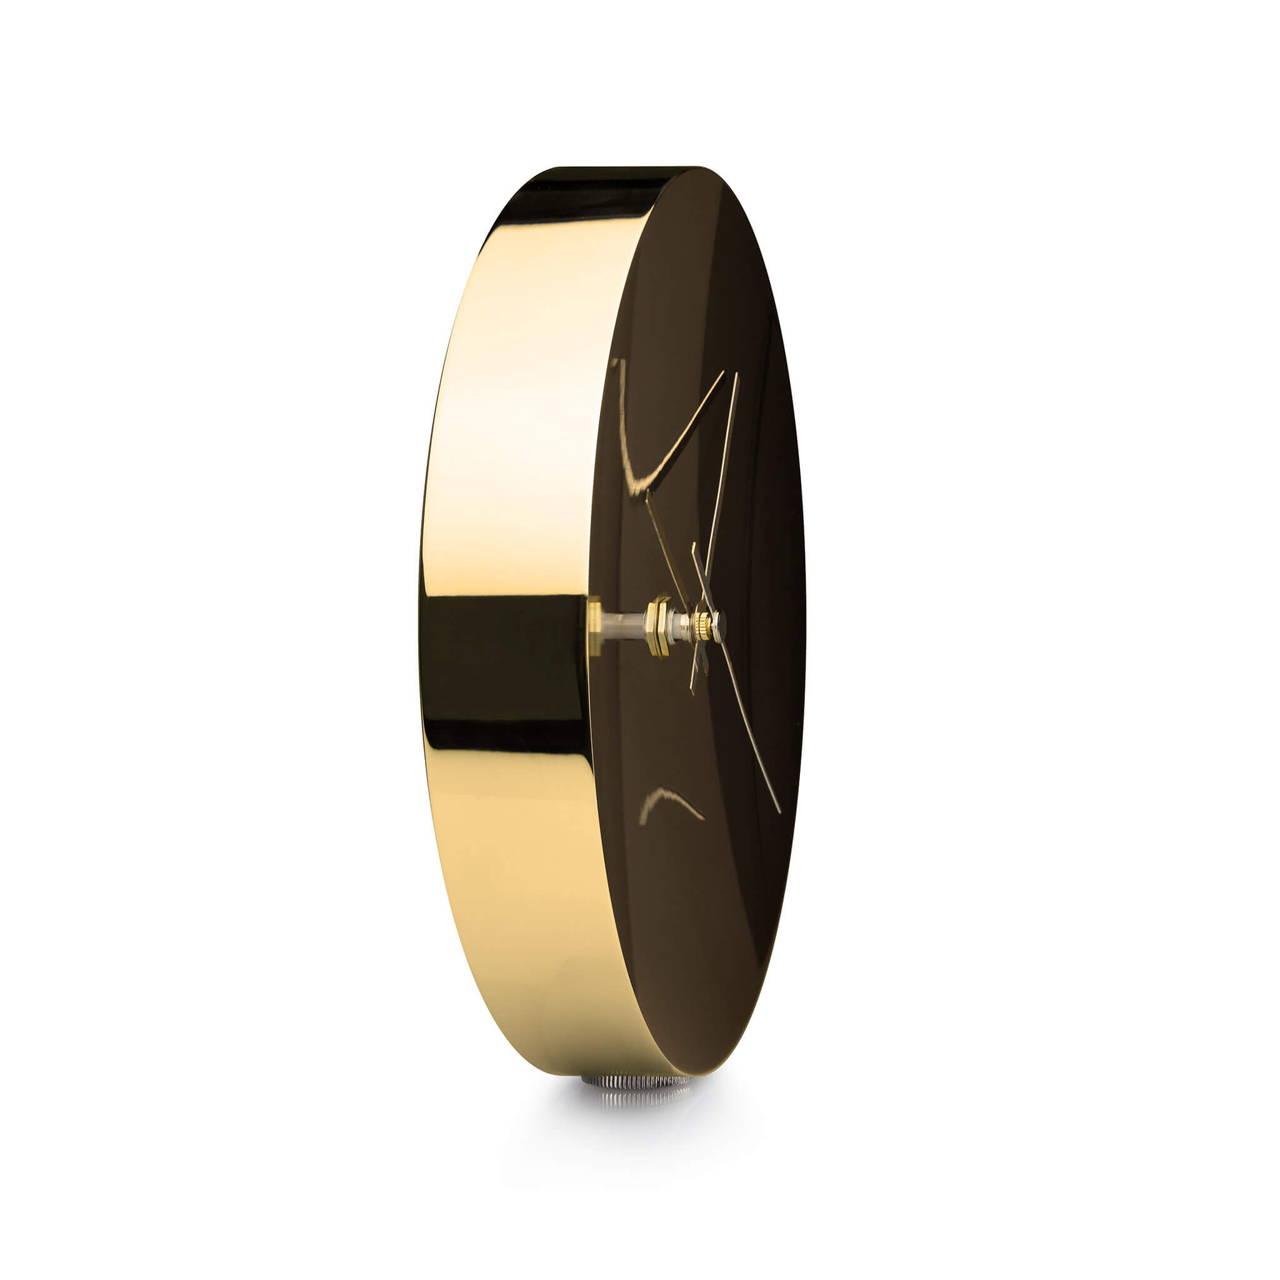 Clock in Gold finish